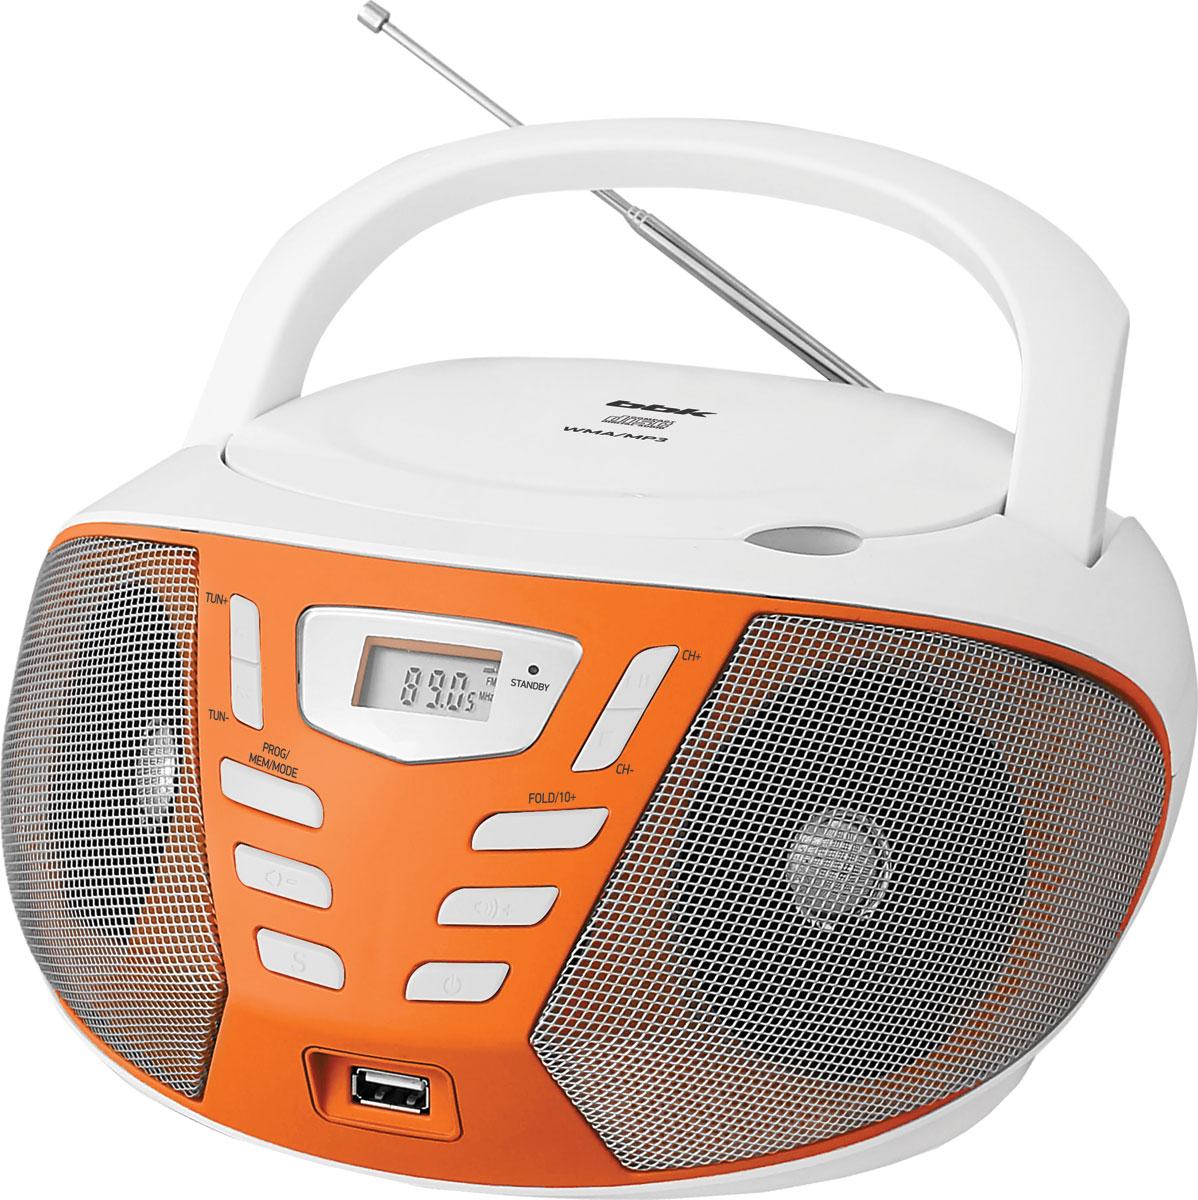 Магнитола BBK BX193U, White Orange CD/MP3 магнитола bbk bx193u white orange